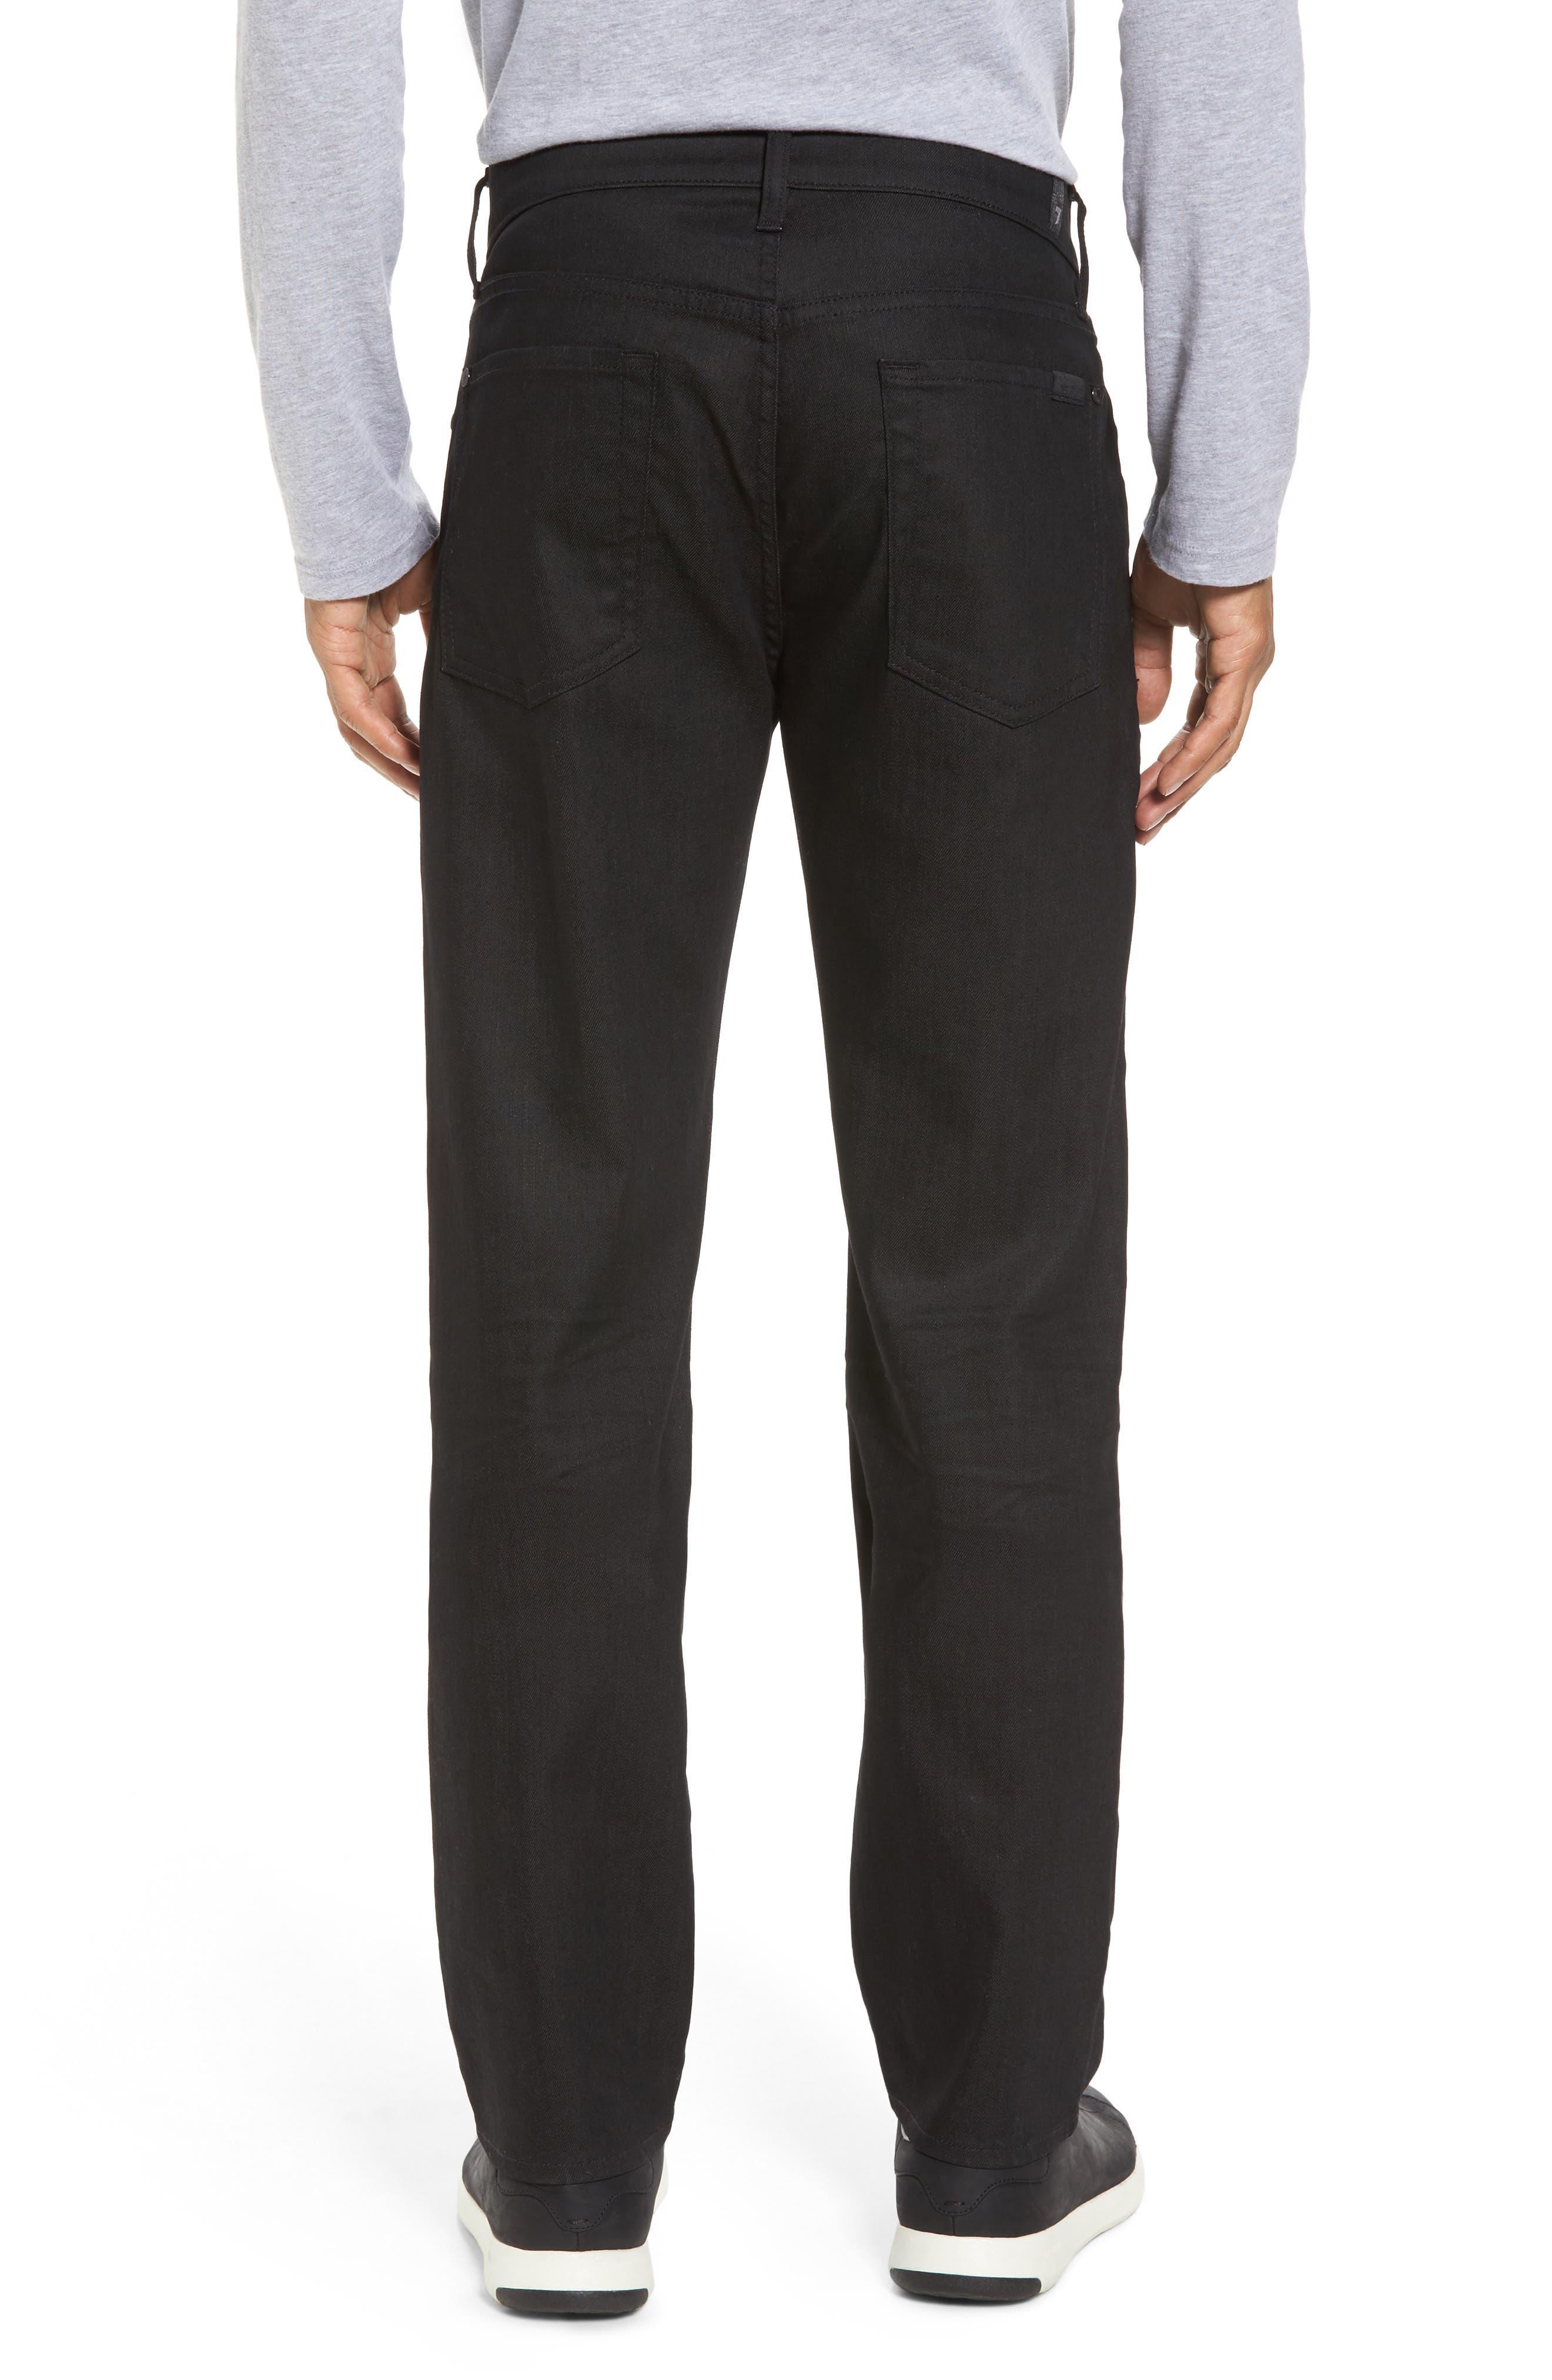 Airweft - Slimmy Slim Fit Jeans,                             Alternate thumbnail 2, color,                             004